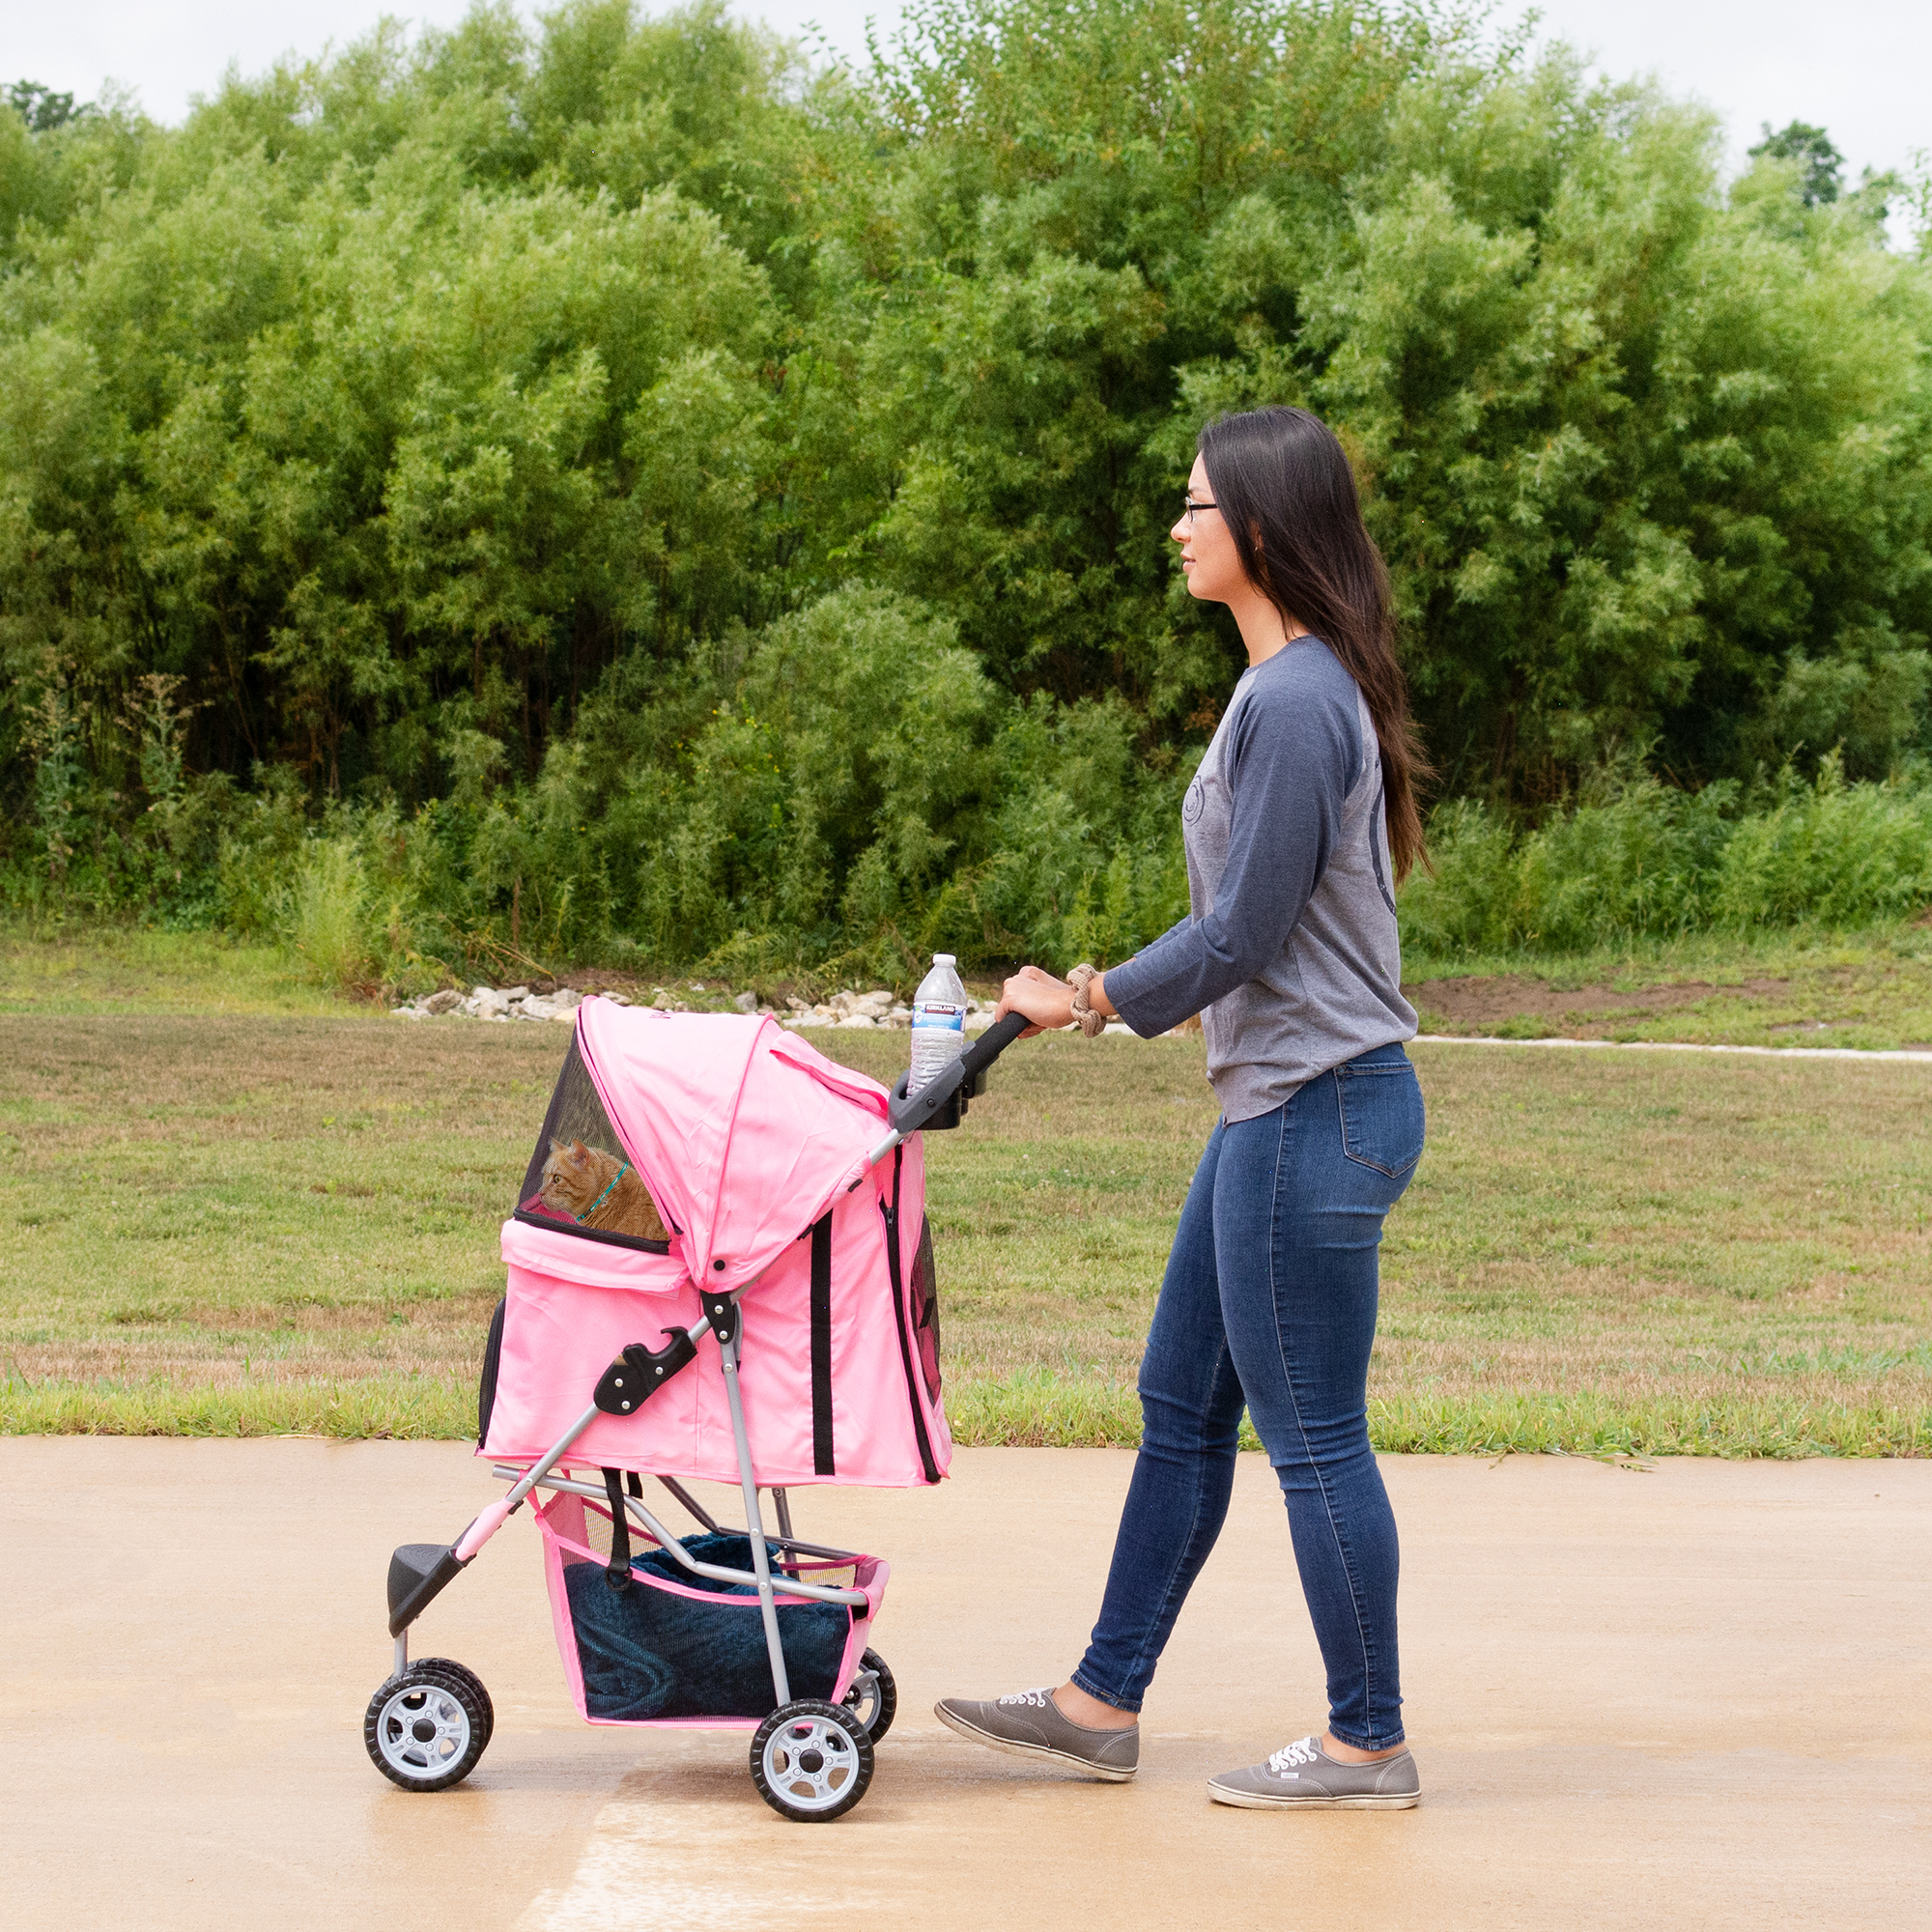 thumbnail 22 - VIVO Three Wheel Pet Stroller / Cat & Dog Foldable Carrier Strolling Cart